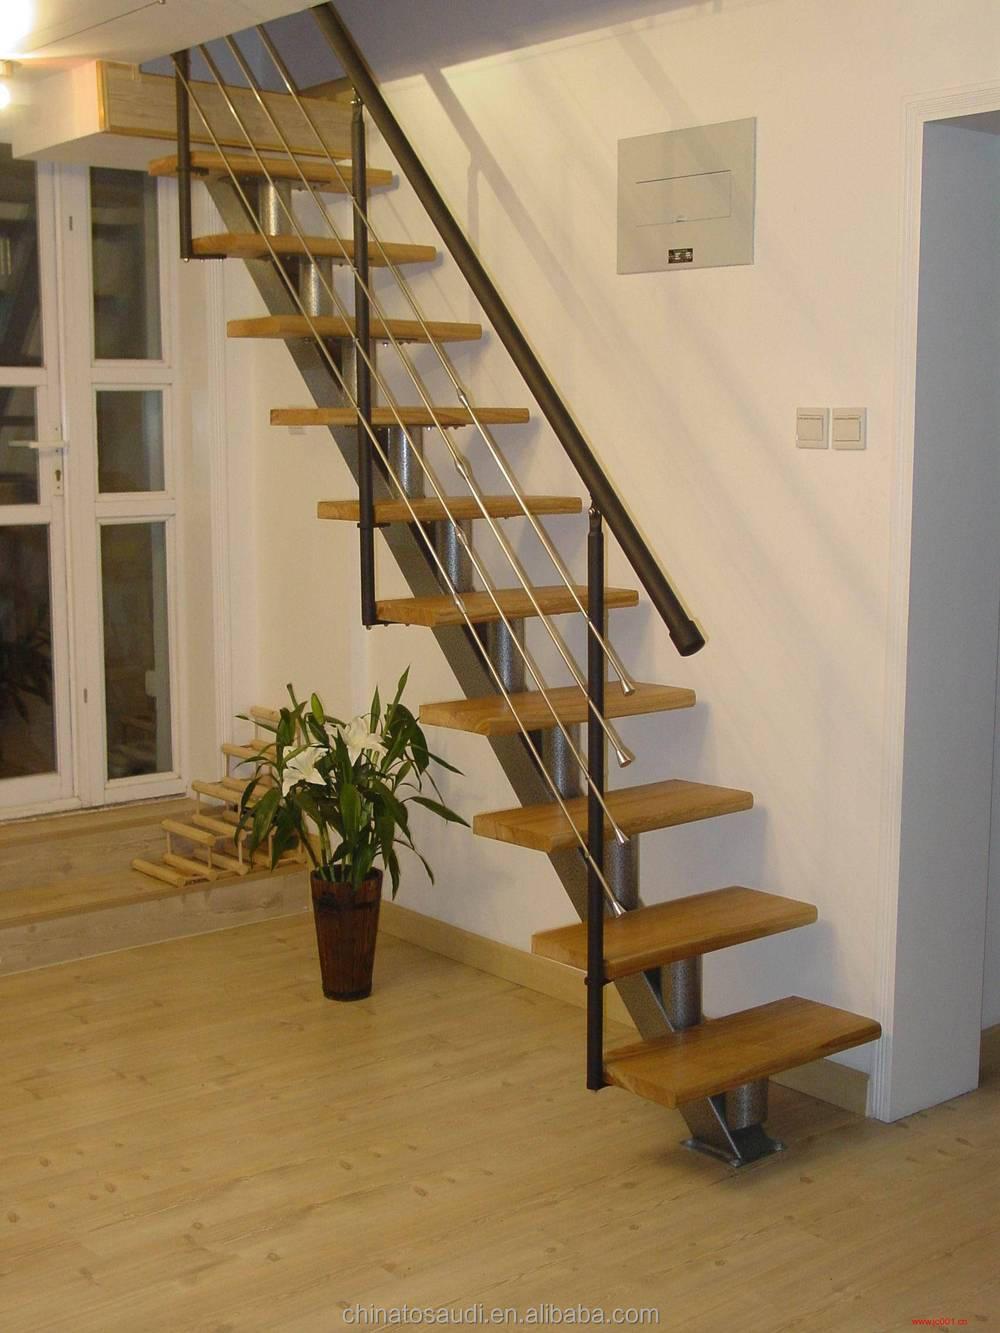 Attirant Spiral Stairs/prefabricated Spiral Stairs/metal Spiral Stairs   Buy ...